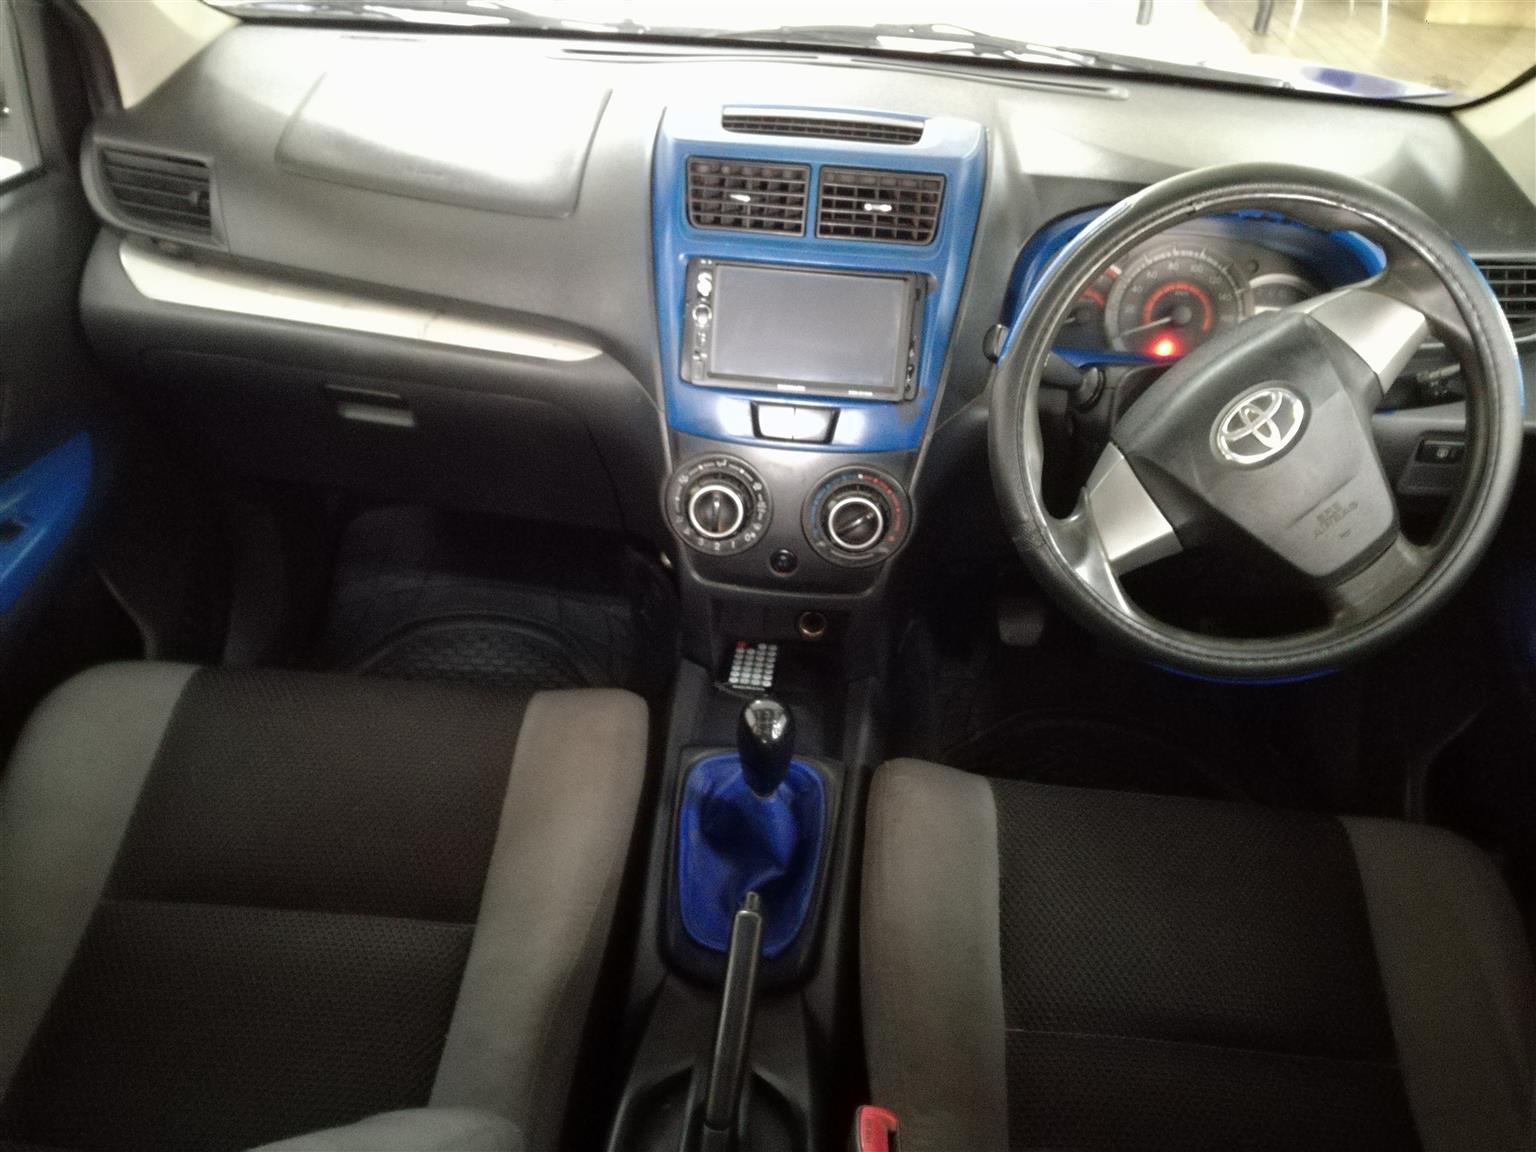 2015 Toyota Avanza 1.5SX Manual Mechanically perfect